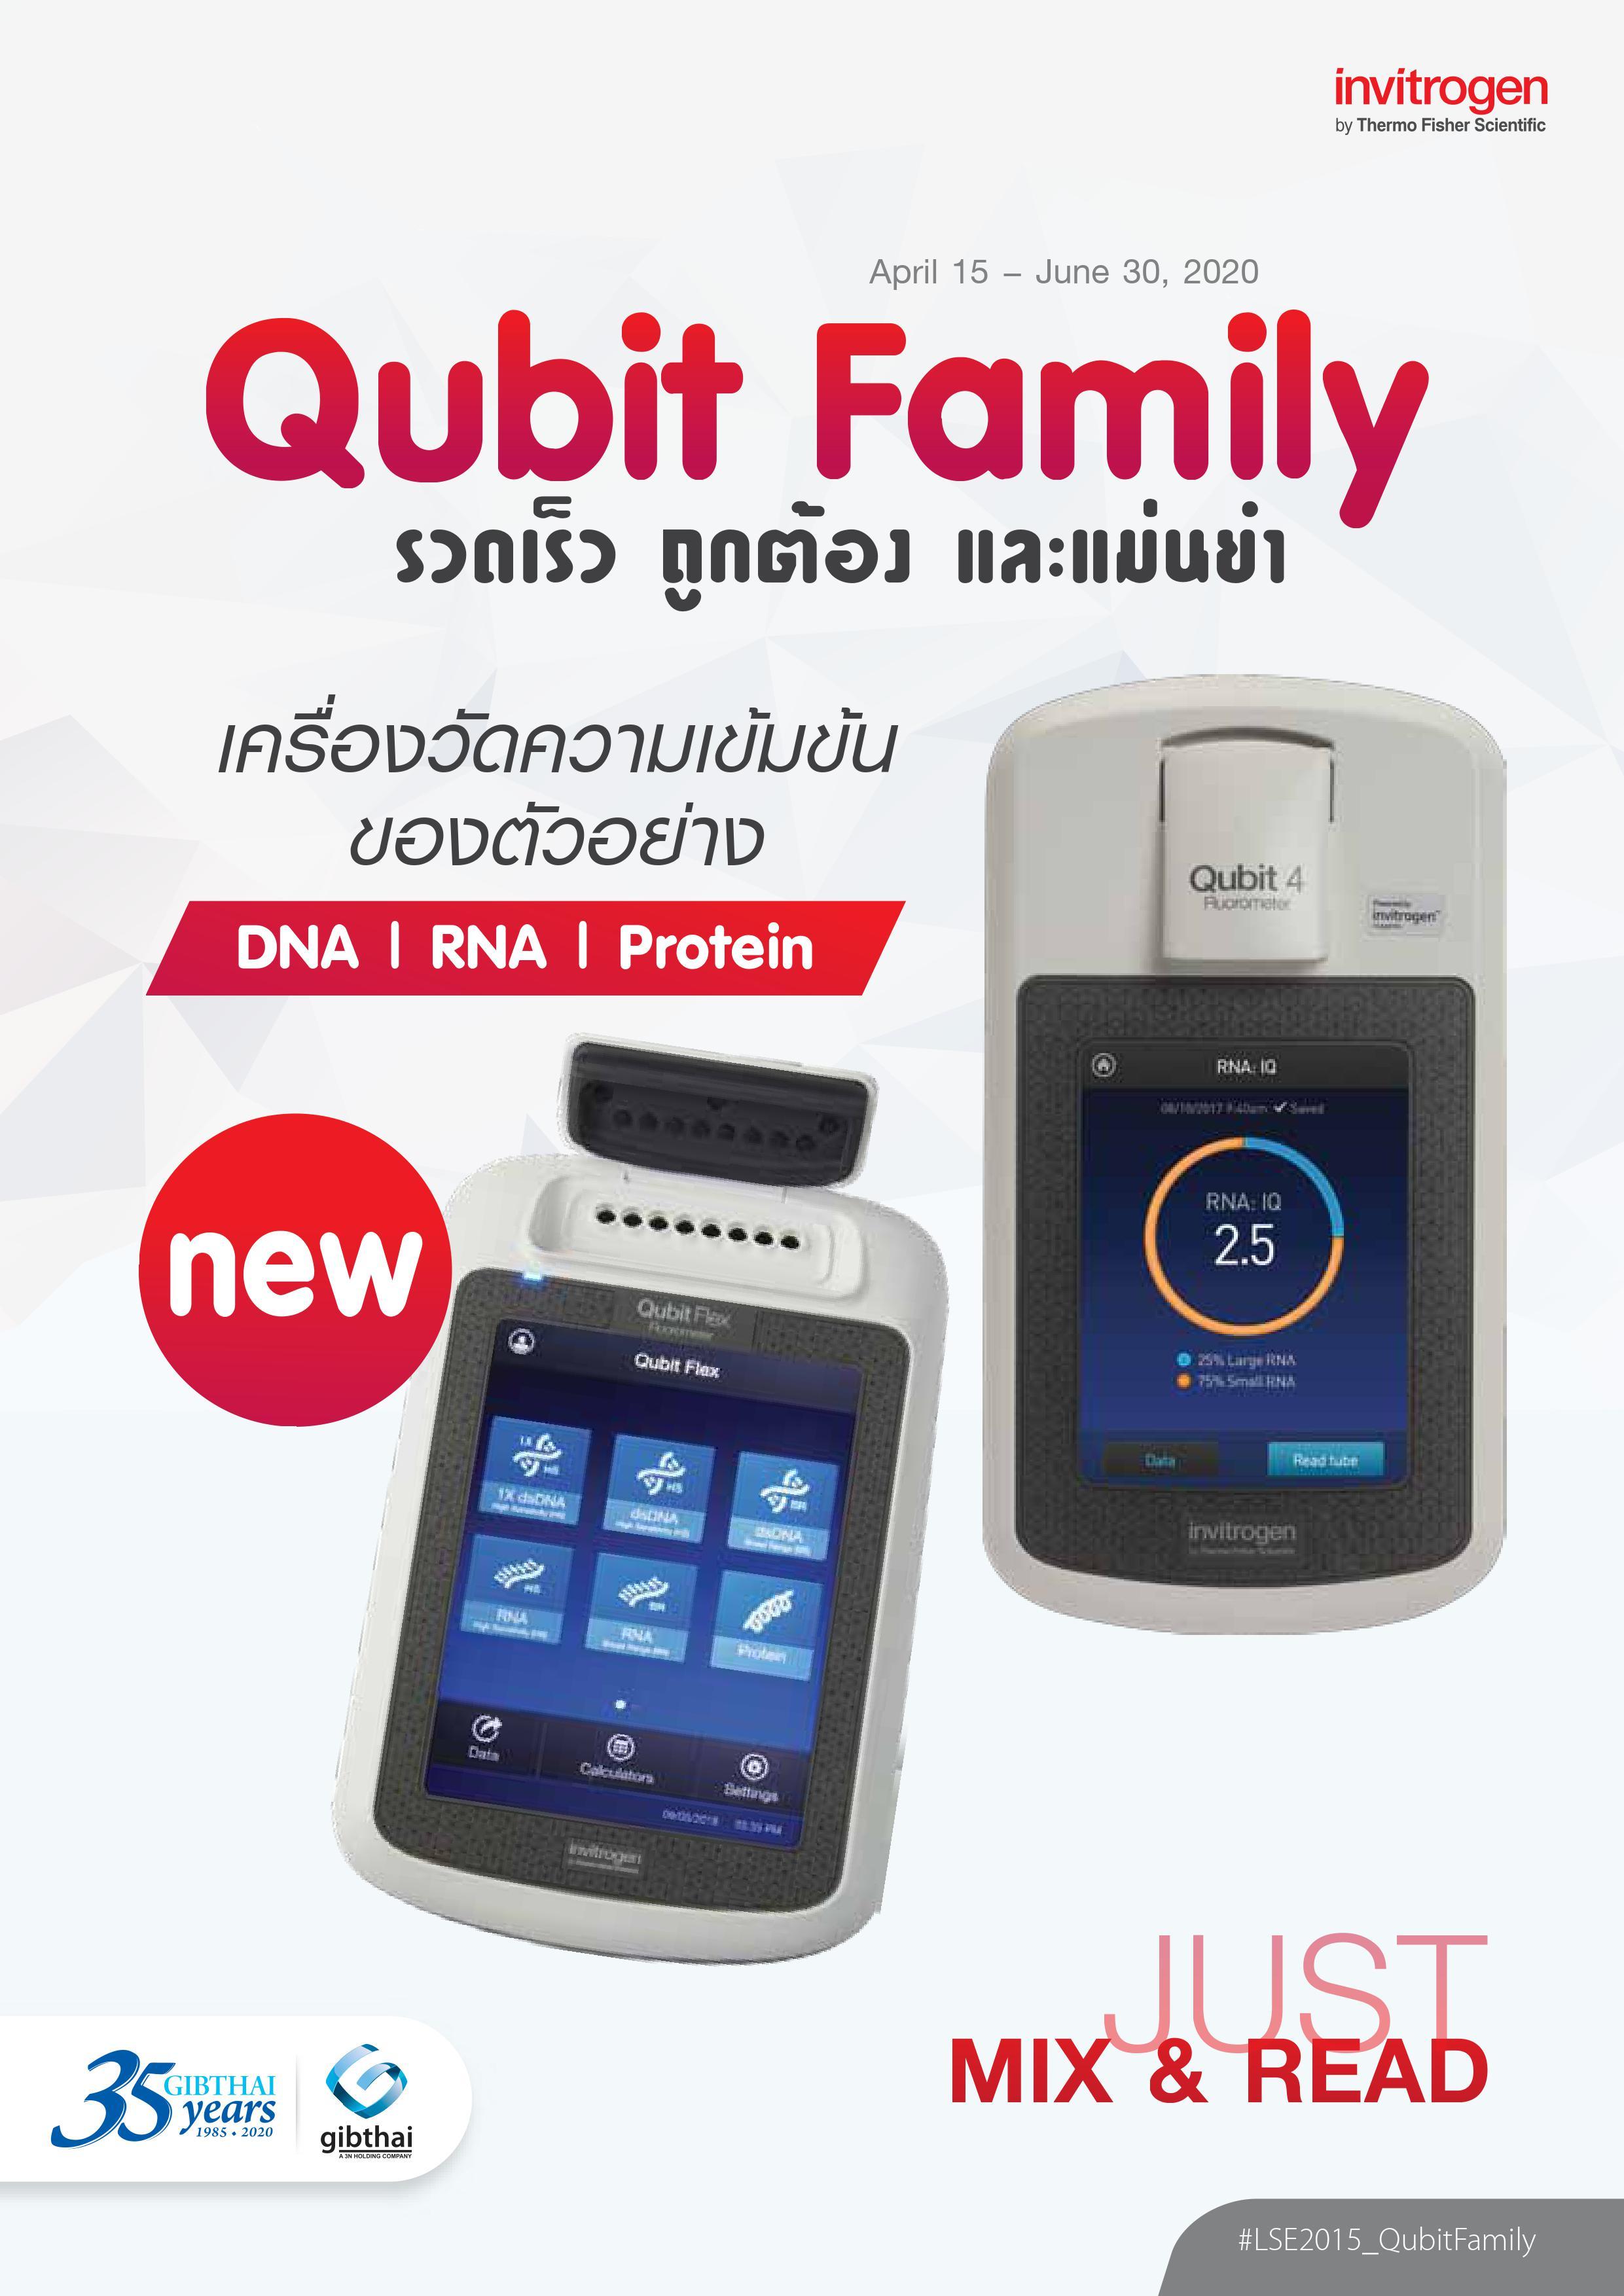 Qubit Family